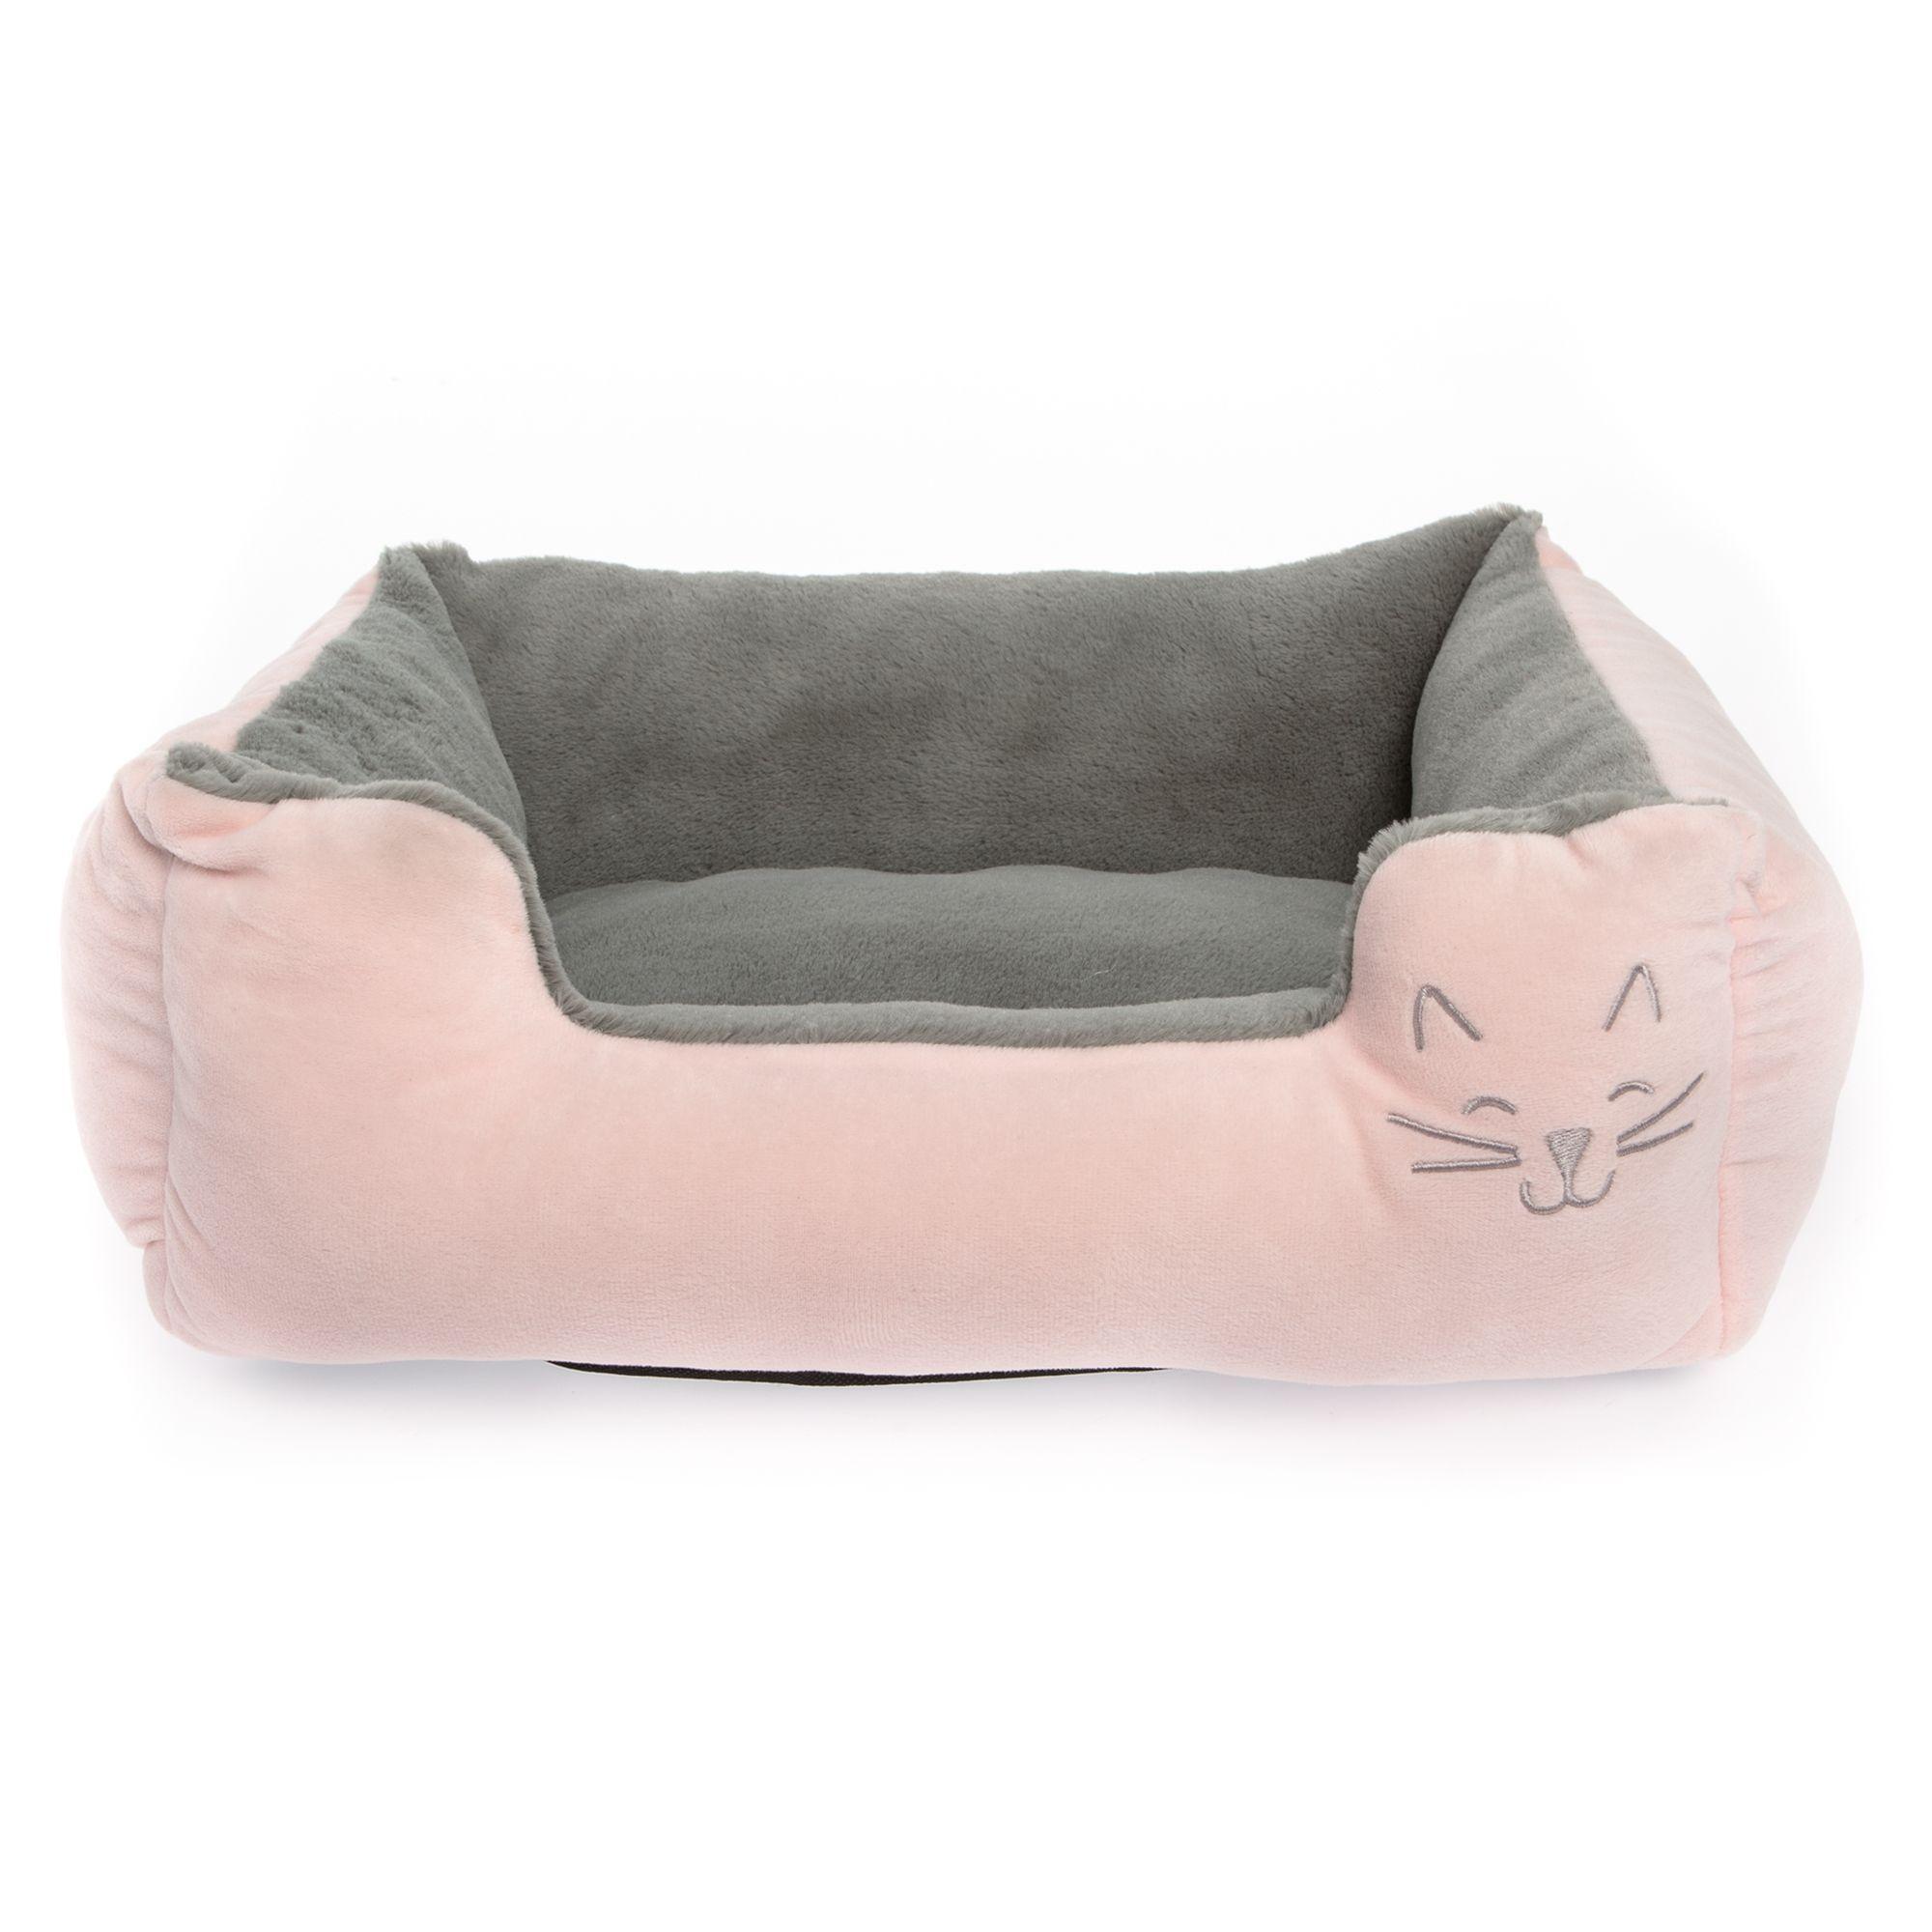 Groovy Whisker City Kitty Face Cuddler Cat Bed Baby Pink Kitten Customarchery Wood Chair Design Ideas Customarcherynet